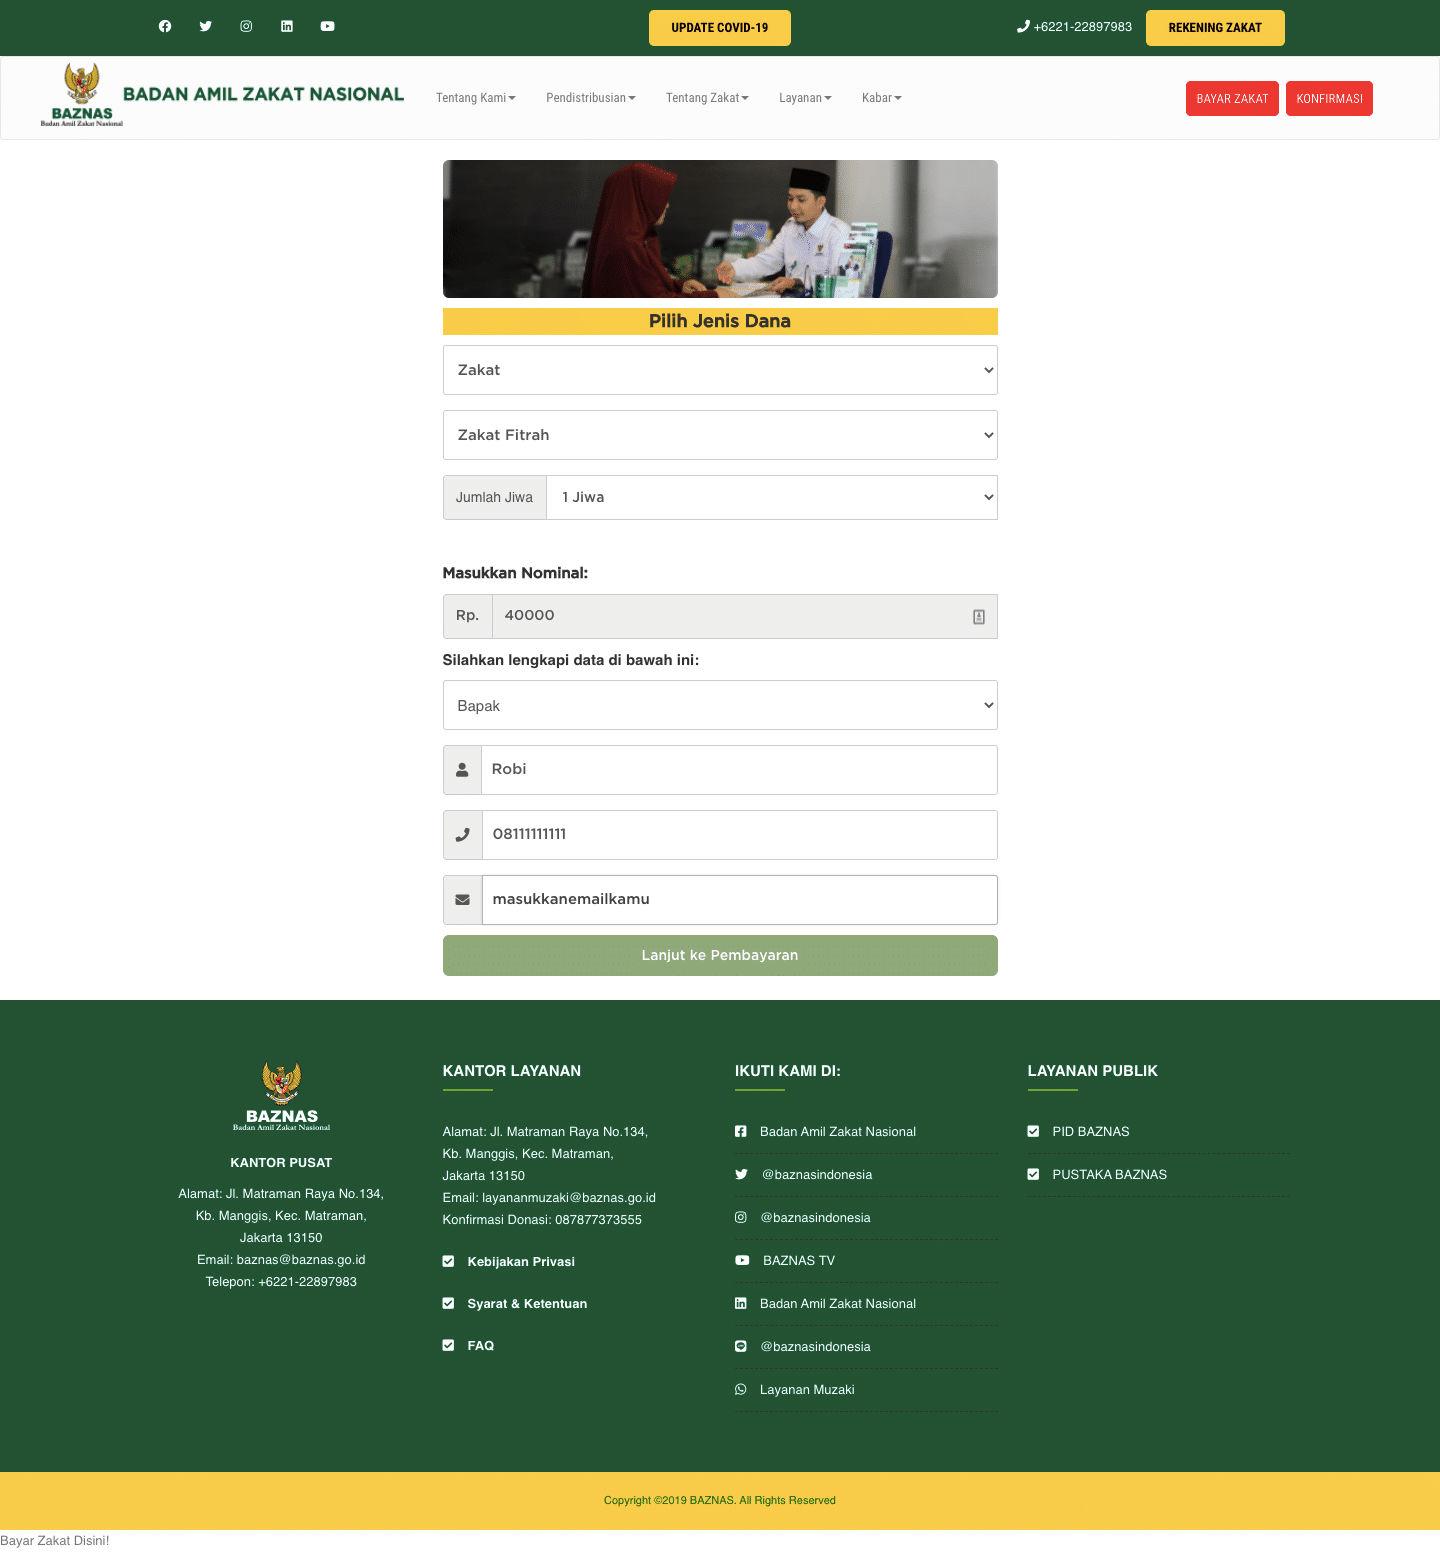 Panduan Membayar Zakat Fitrah Online Di Baznas.go.id